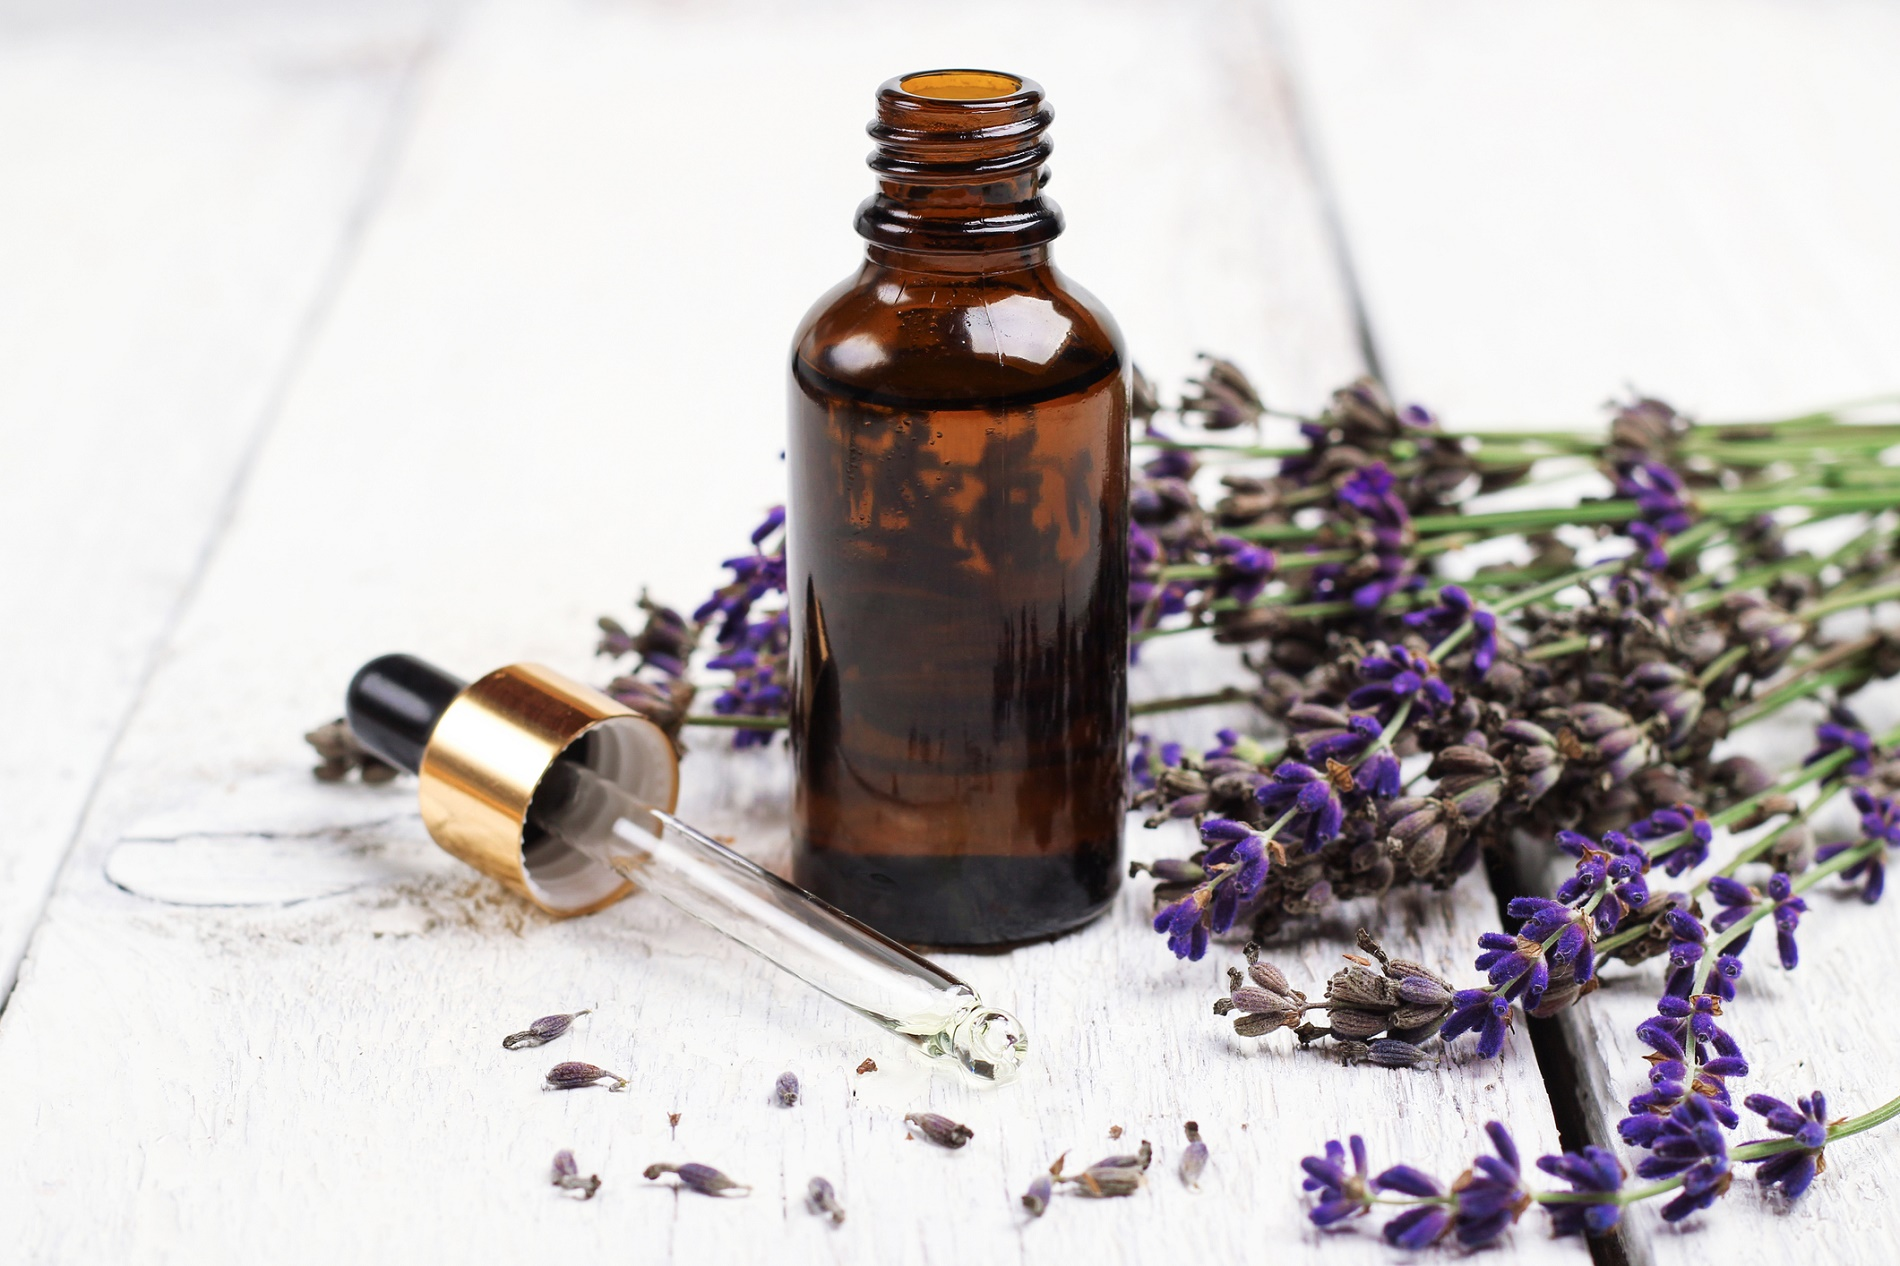 Vertu De La Lavande huiles essentielles : la lavande et ses vertus - madame figaro